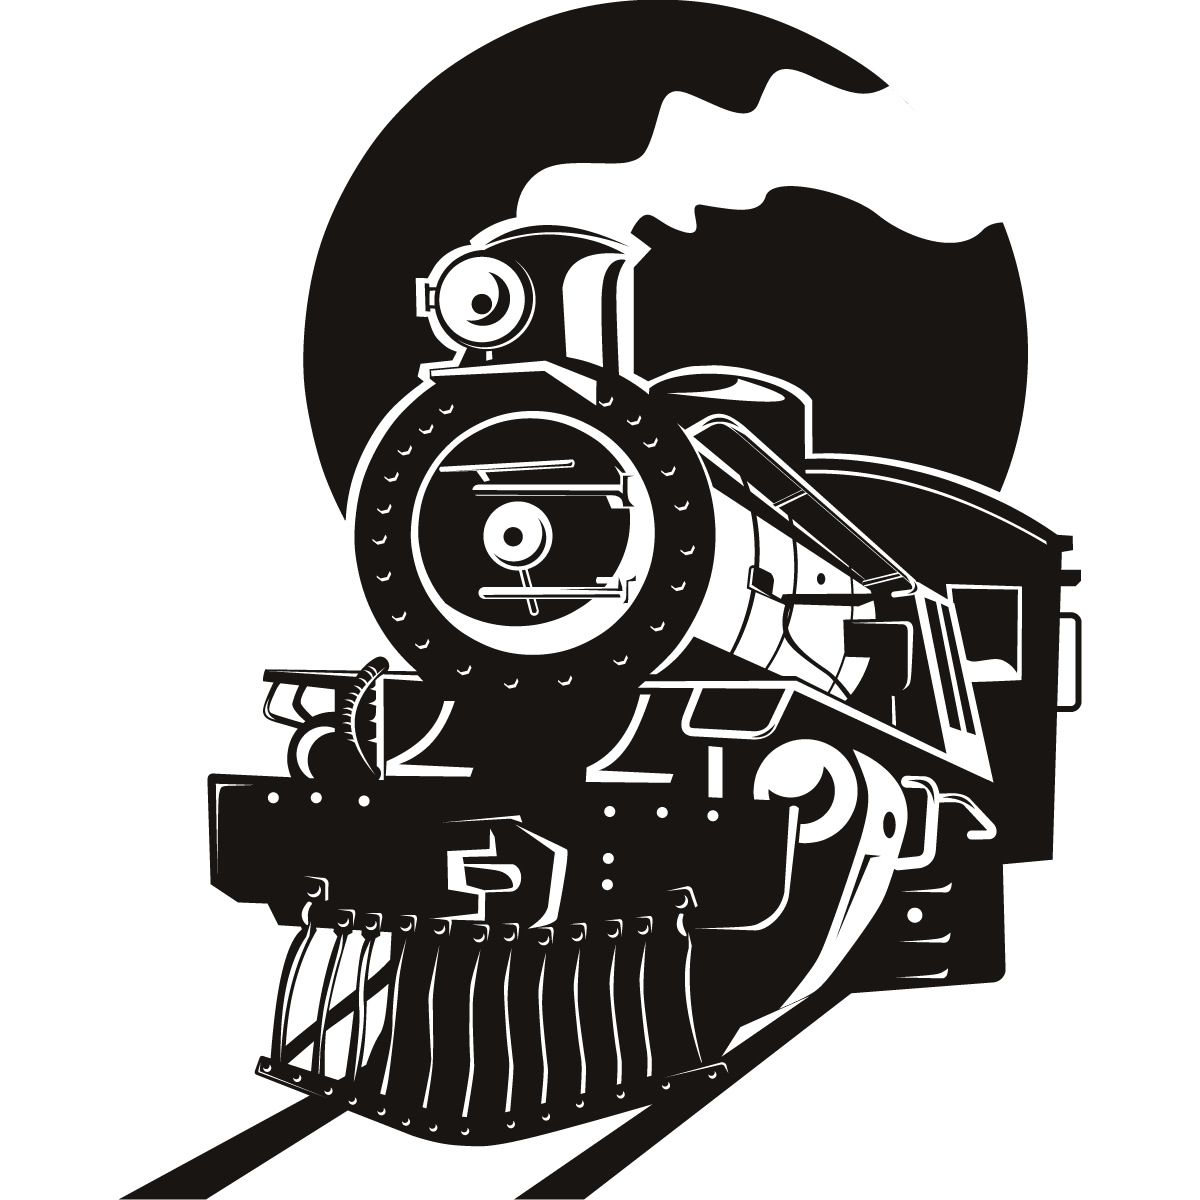 Locomotive Wheel Clip Art : Steam locomotive silhouette